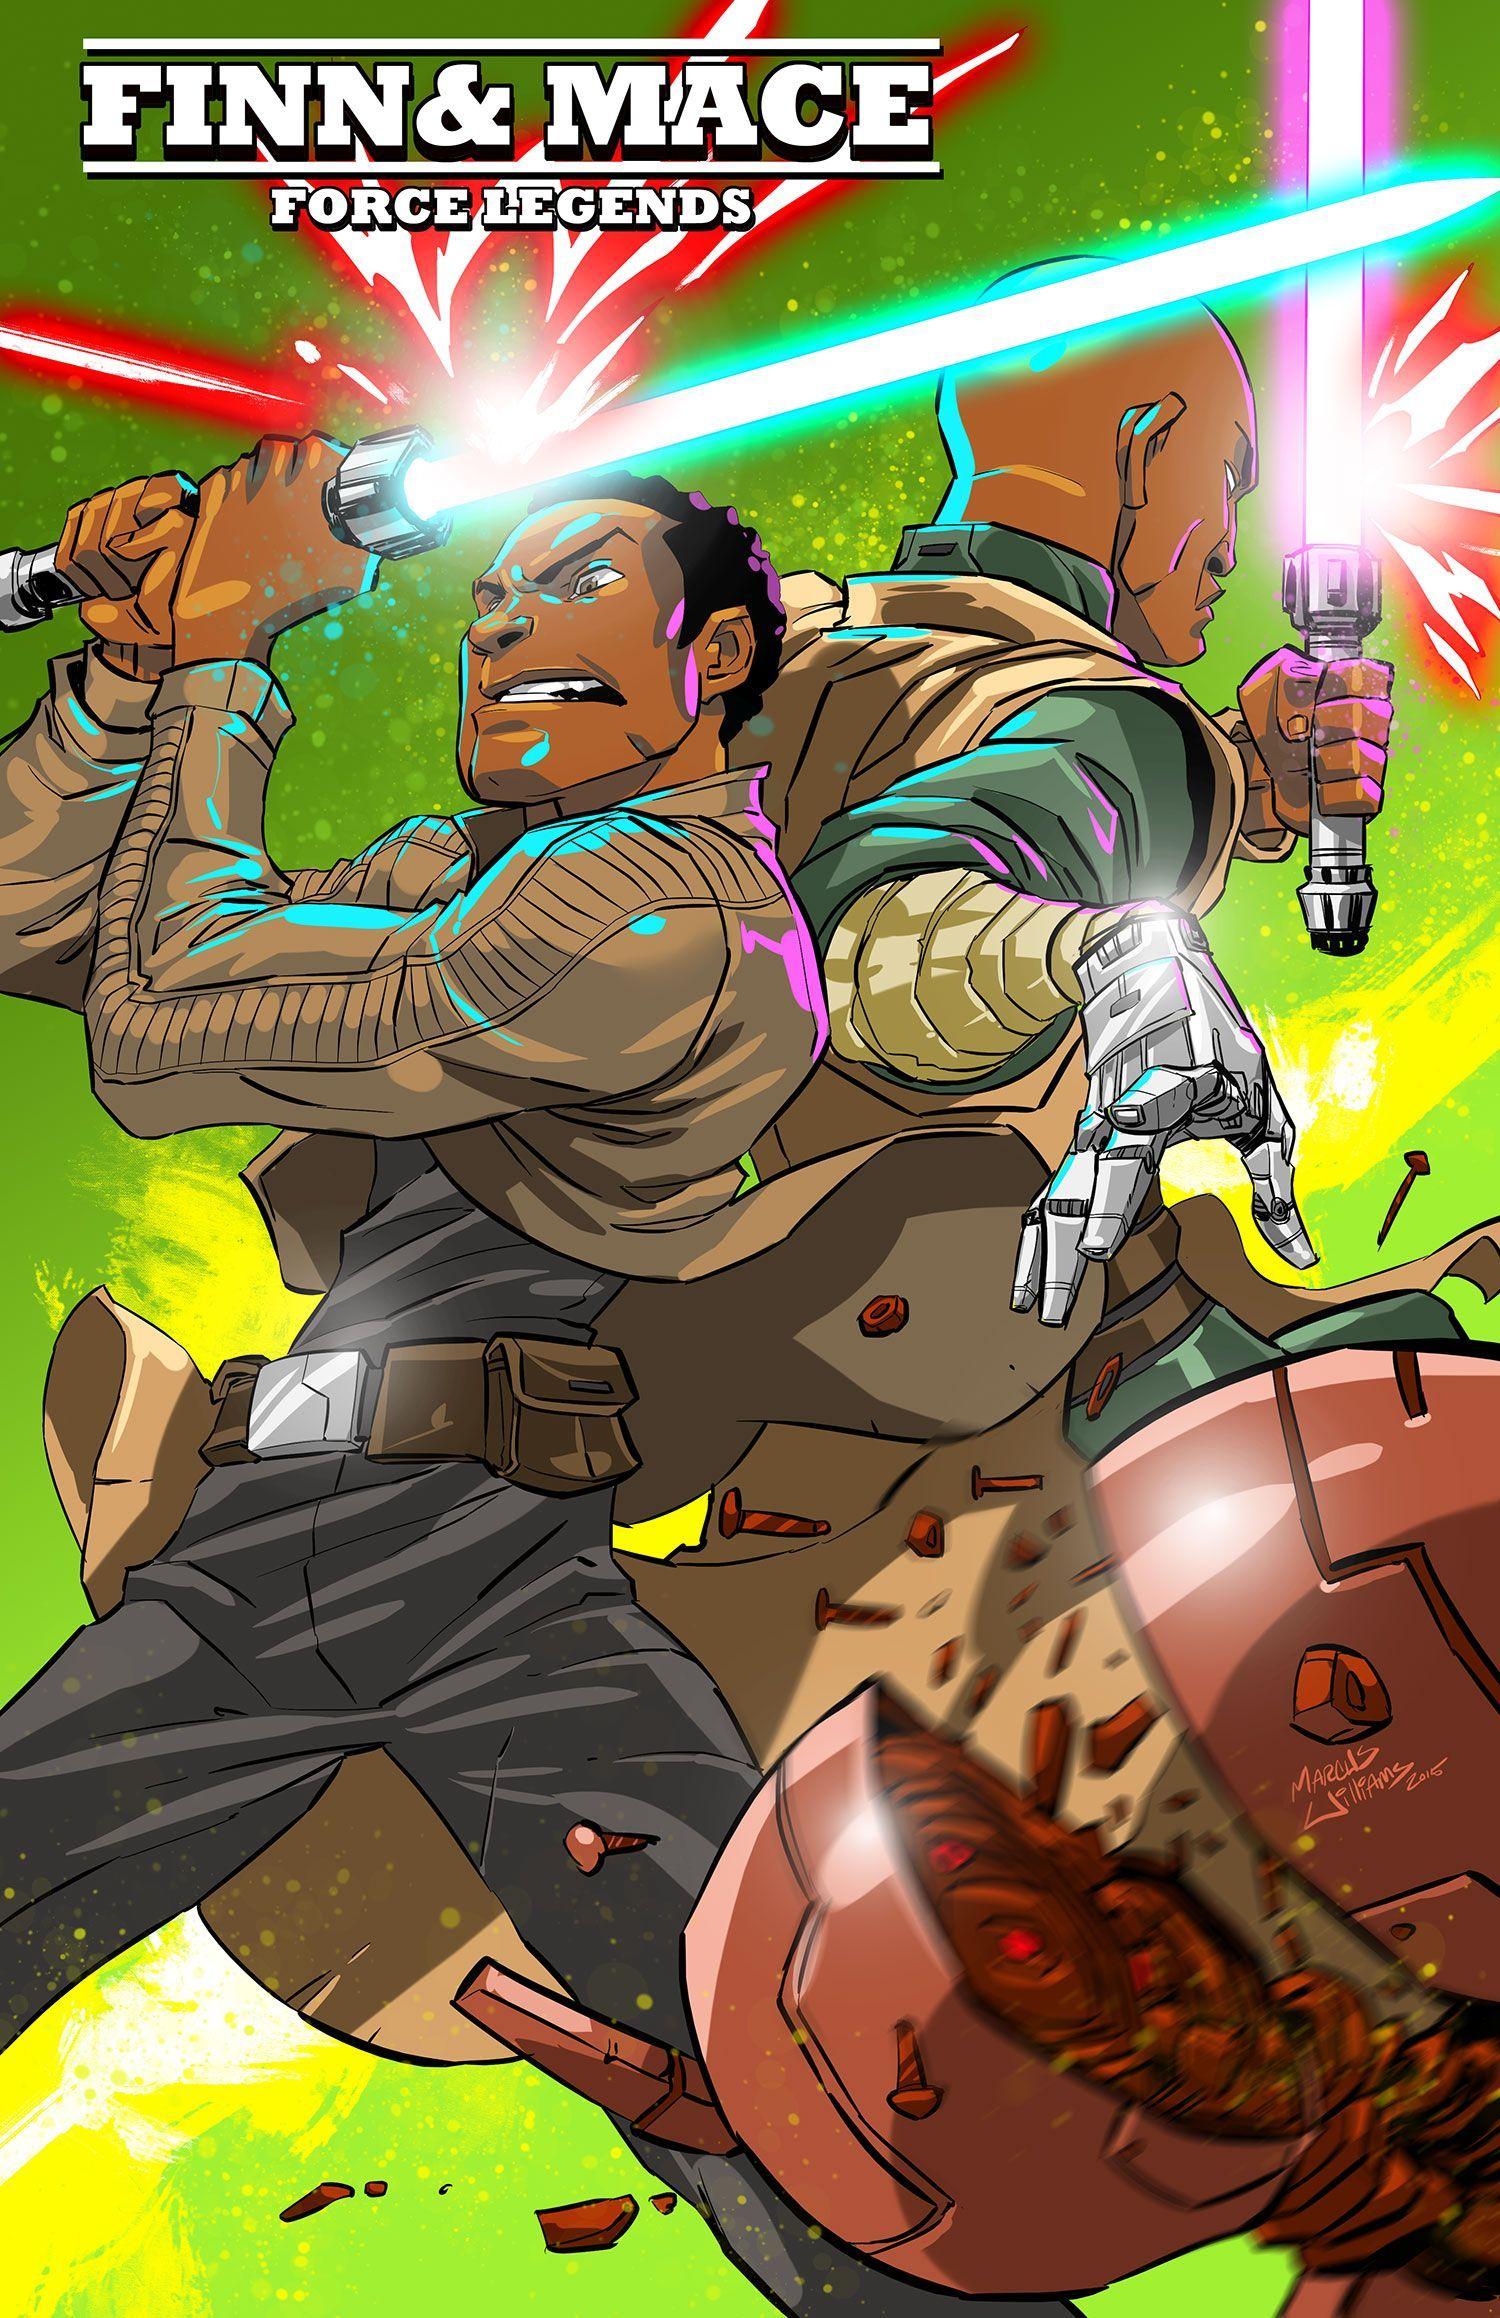 Marcus Williams is creating Artwork + Comics | Patreon